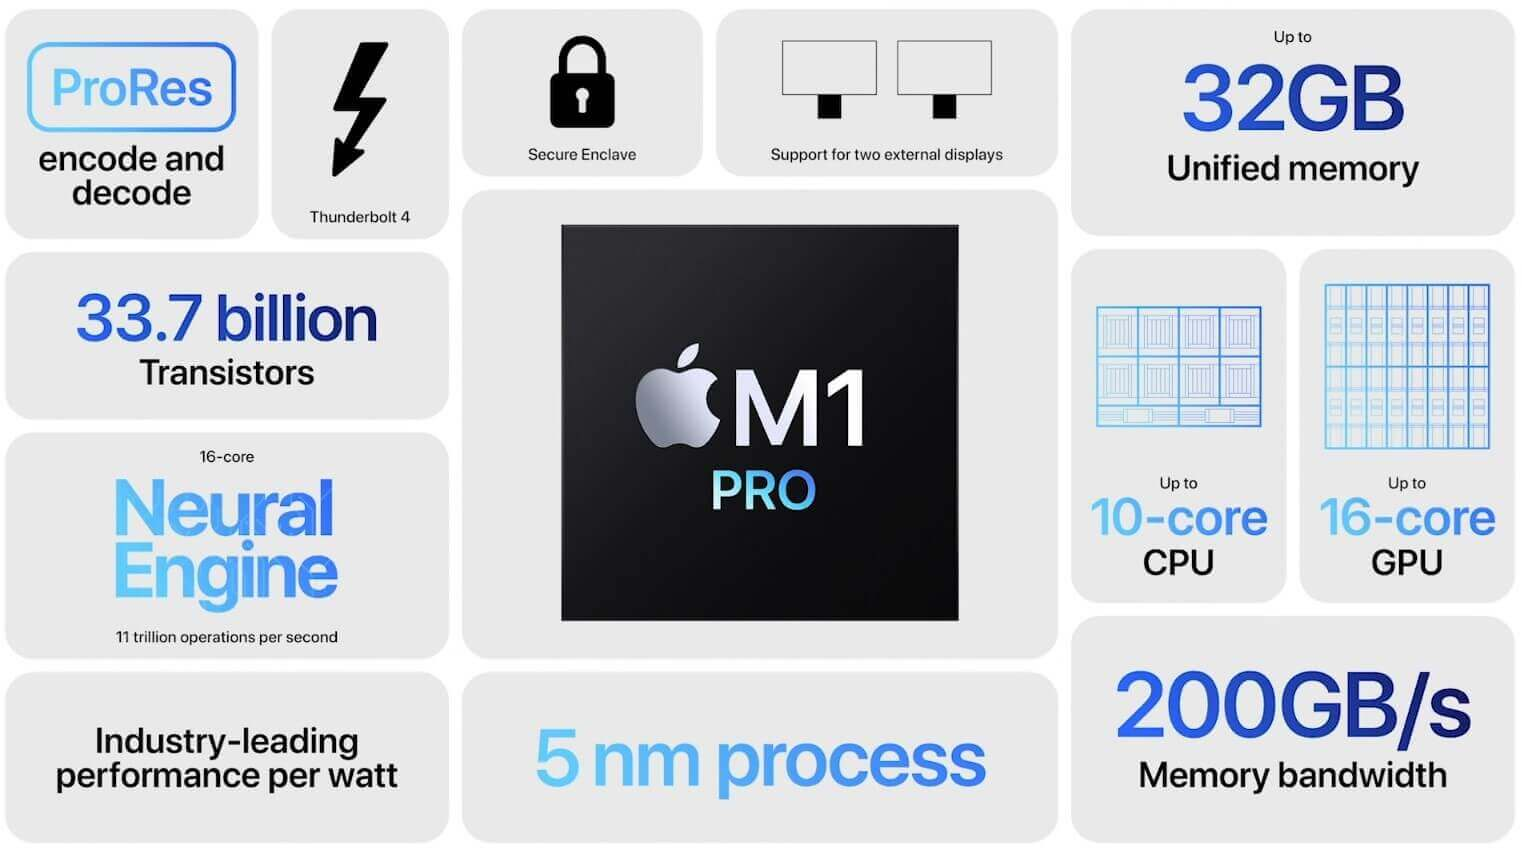 sum m1 pro system